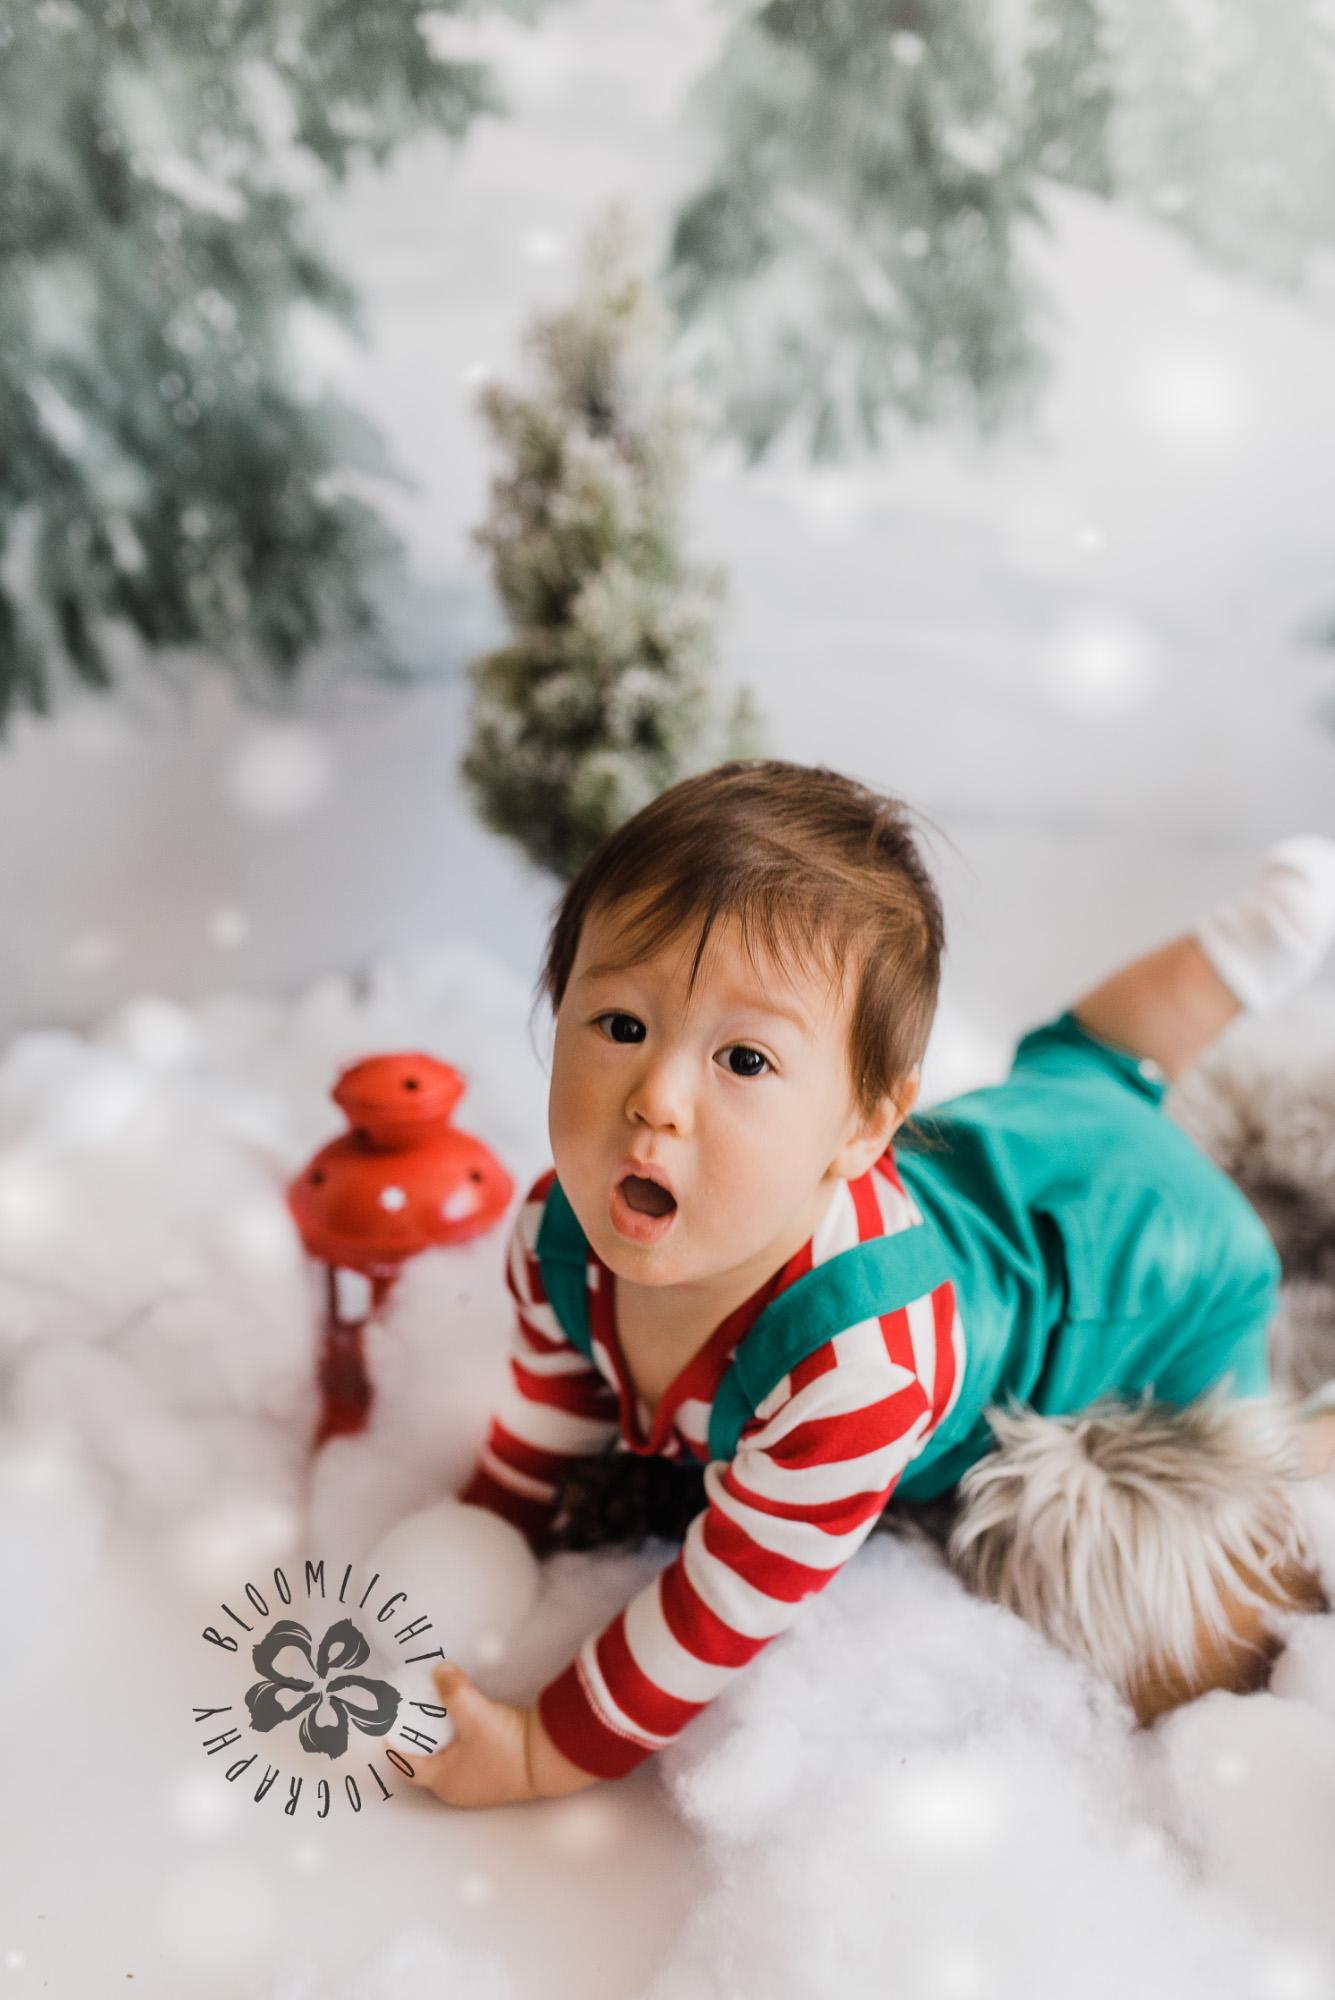 Toronto-NorthYork-Christmas-Minis-Holiday-Photographer-baby-children-kid-photo (22).jpg